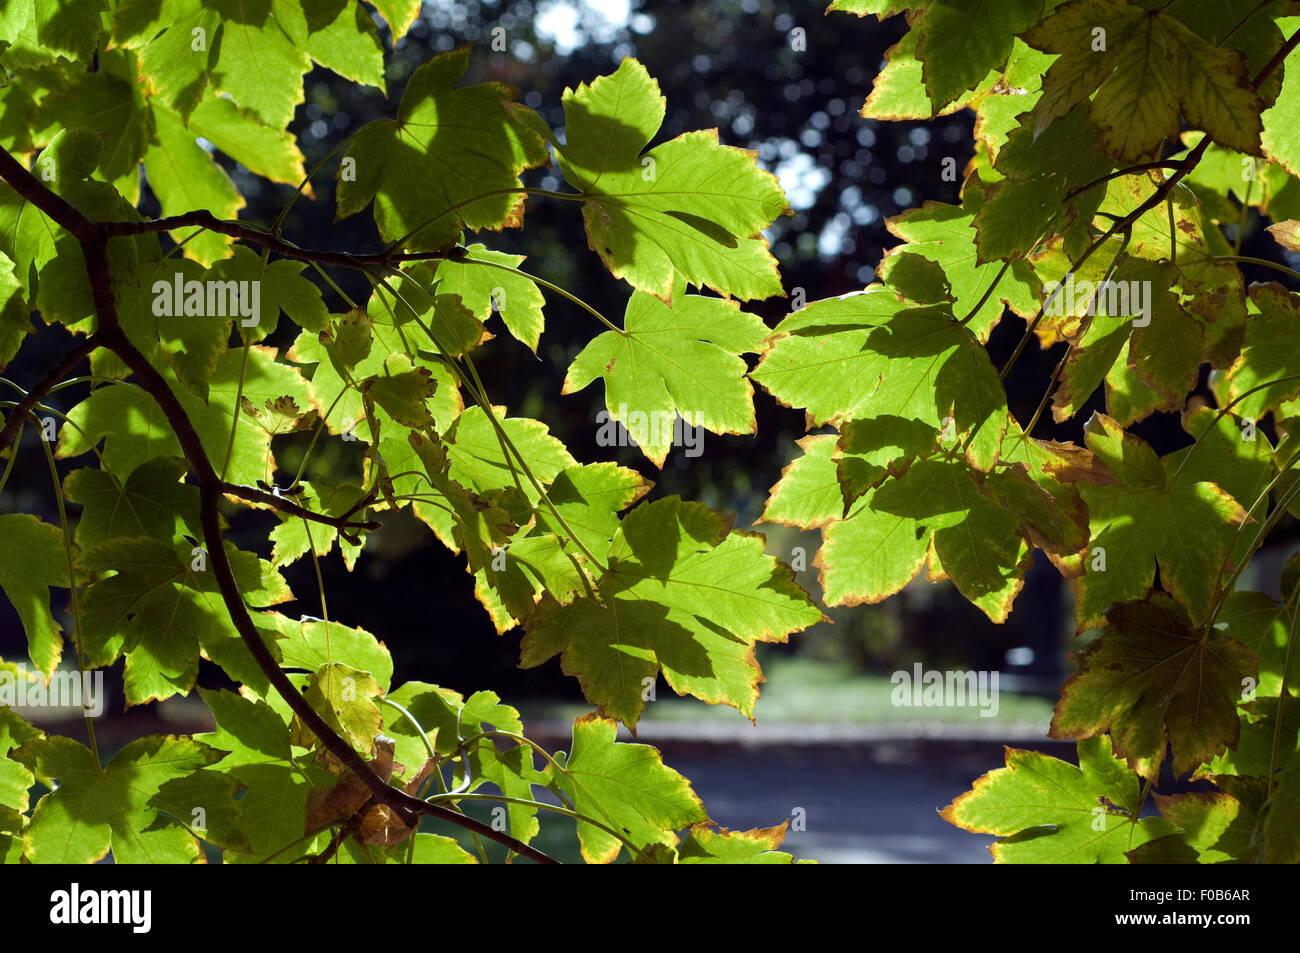 Herbstblaetter Immagini Stock